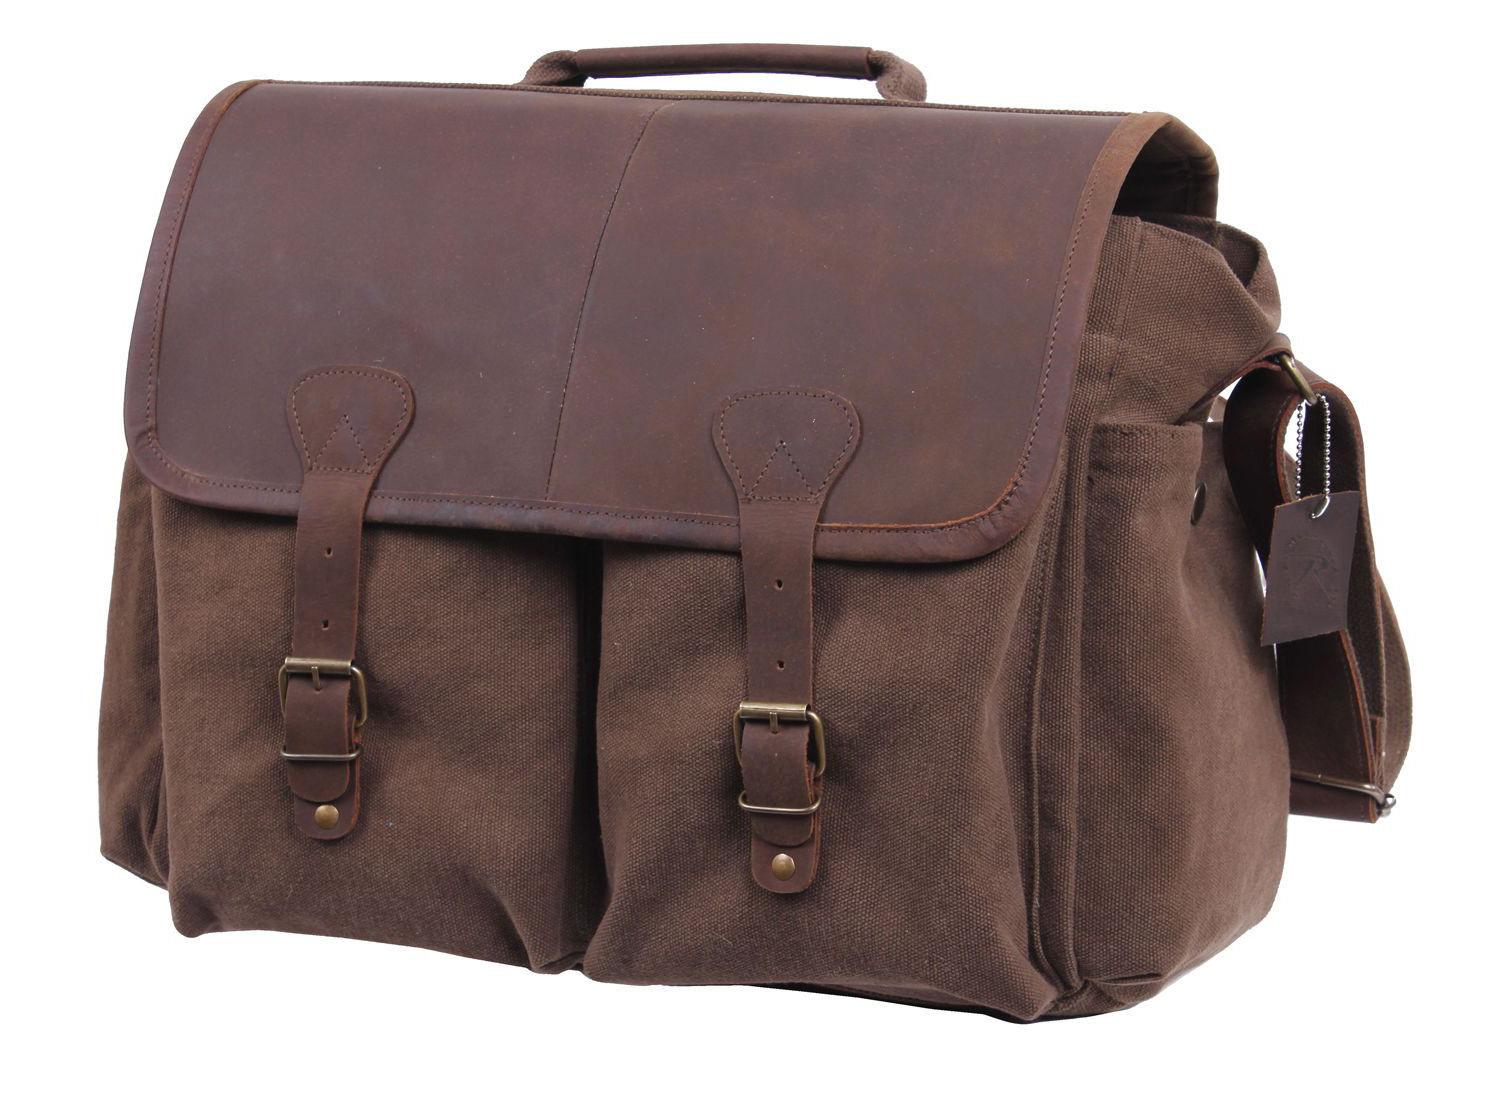 rothco messenger bag eastpak messenger bag timbuk2 classic messenger bag